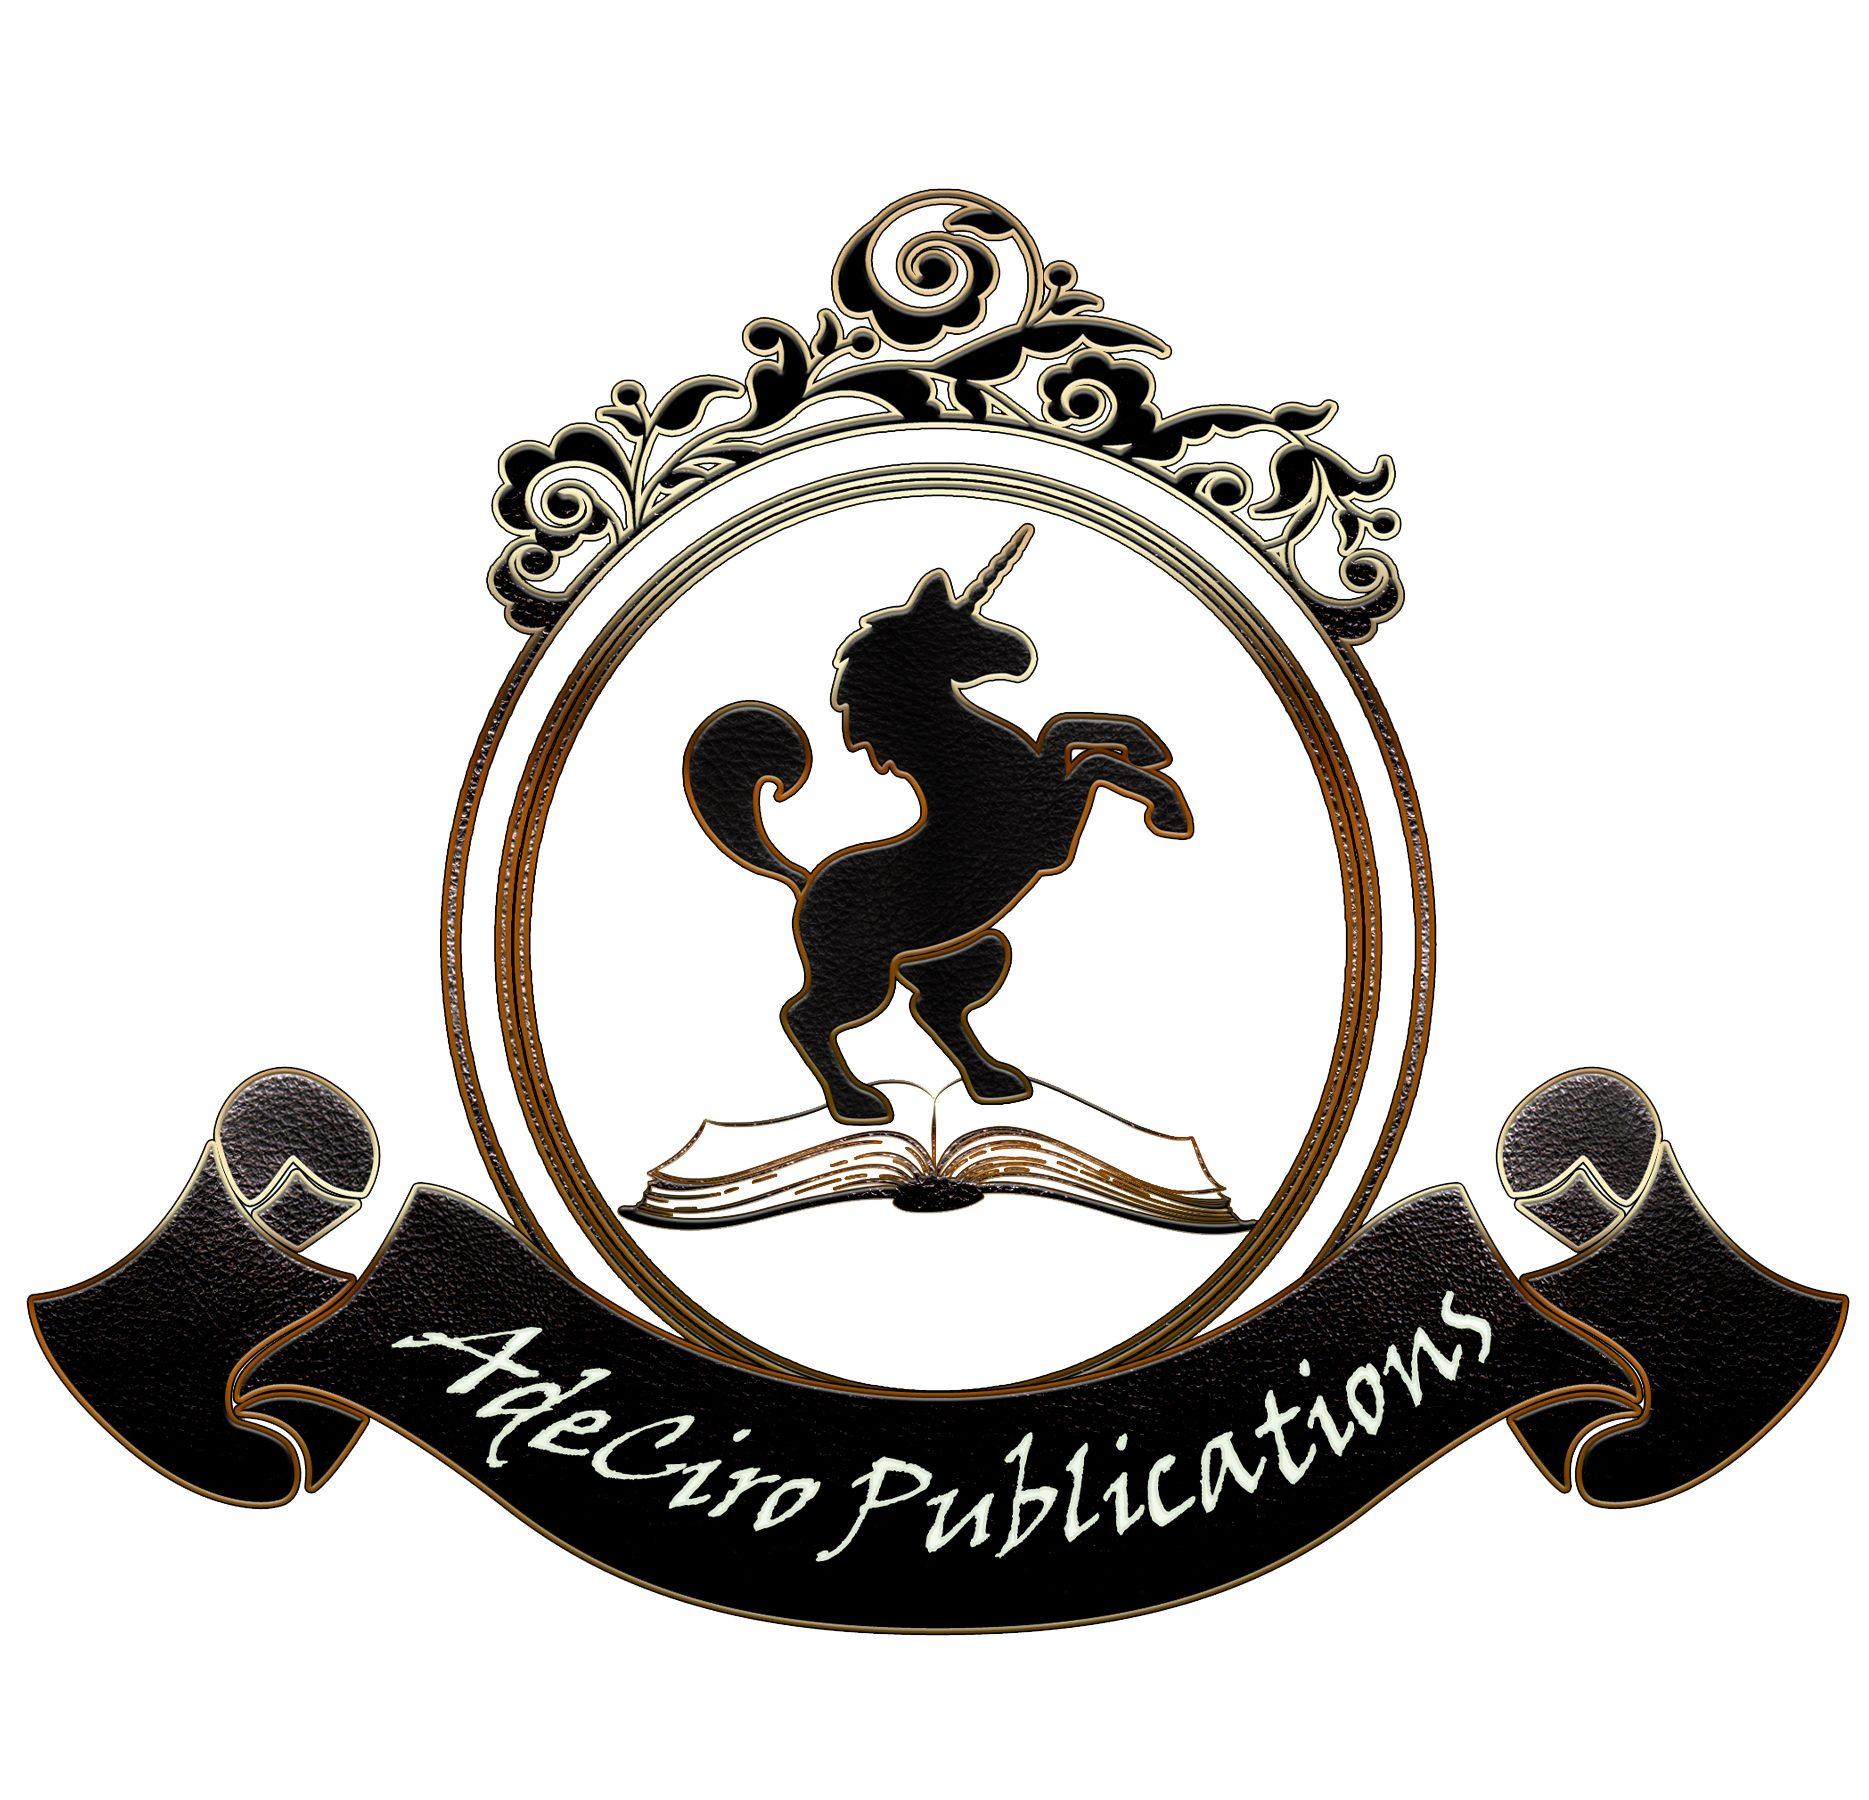 AdeCiro Publications